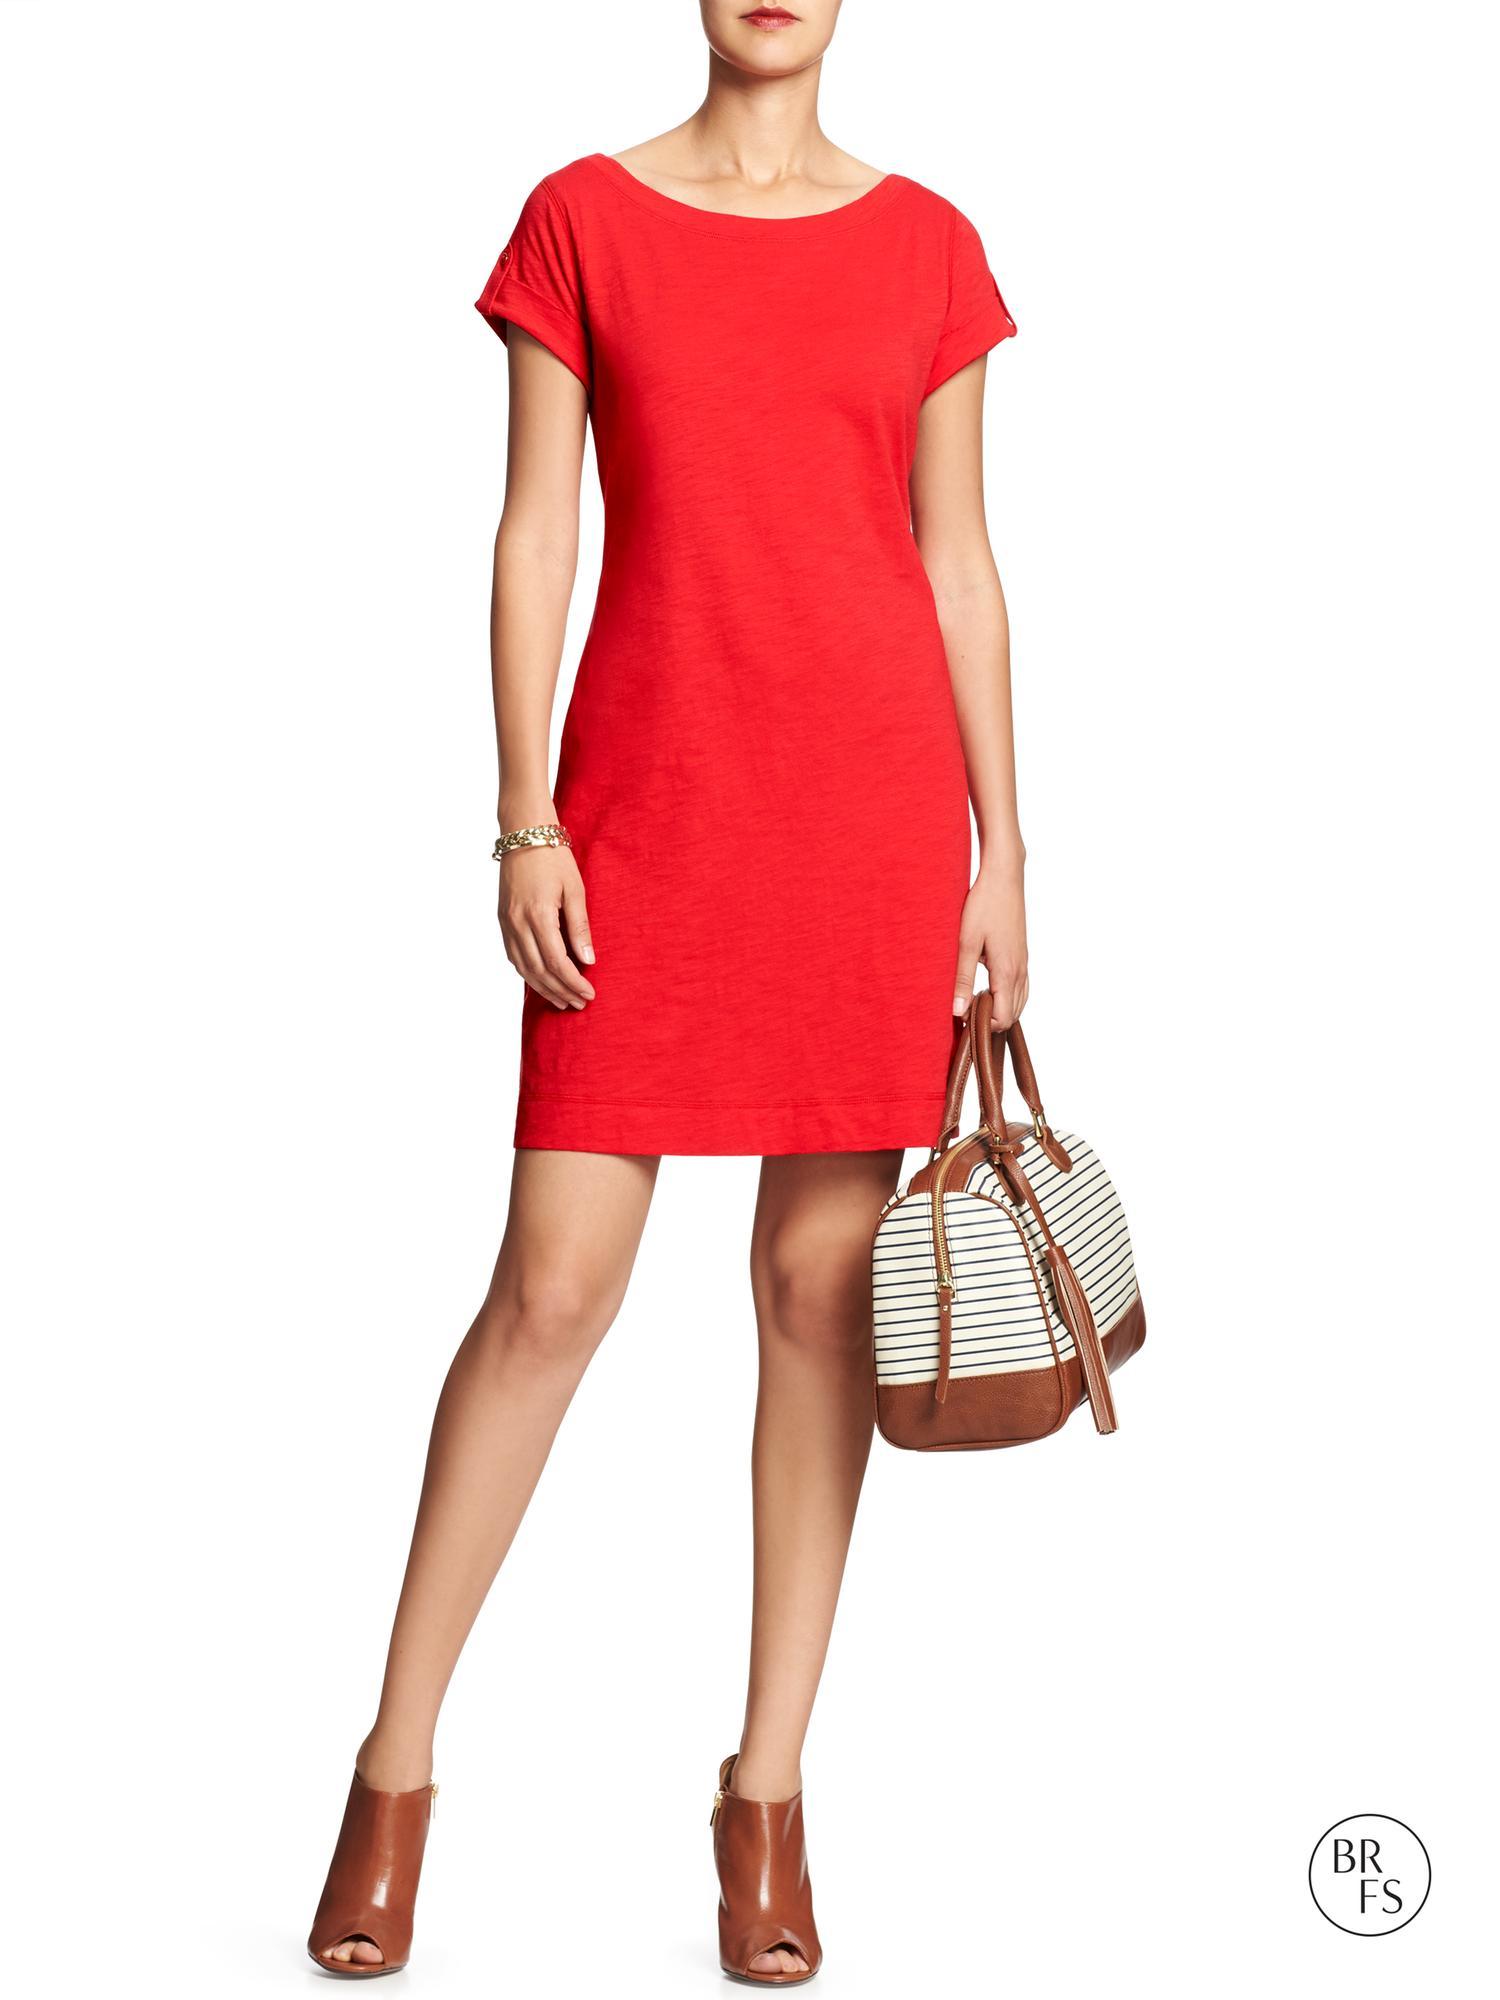 Banana Republic Factory Solid Slub Knit Dress Rainbow Red